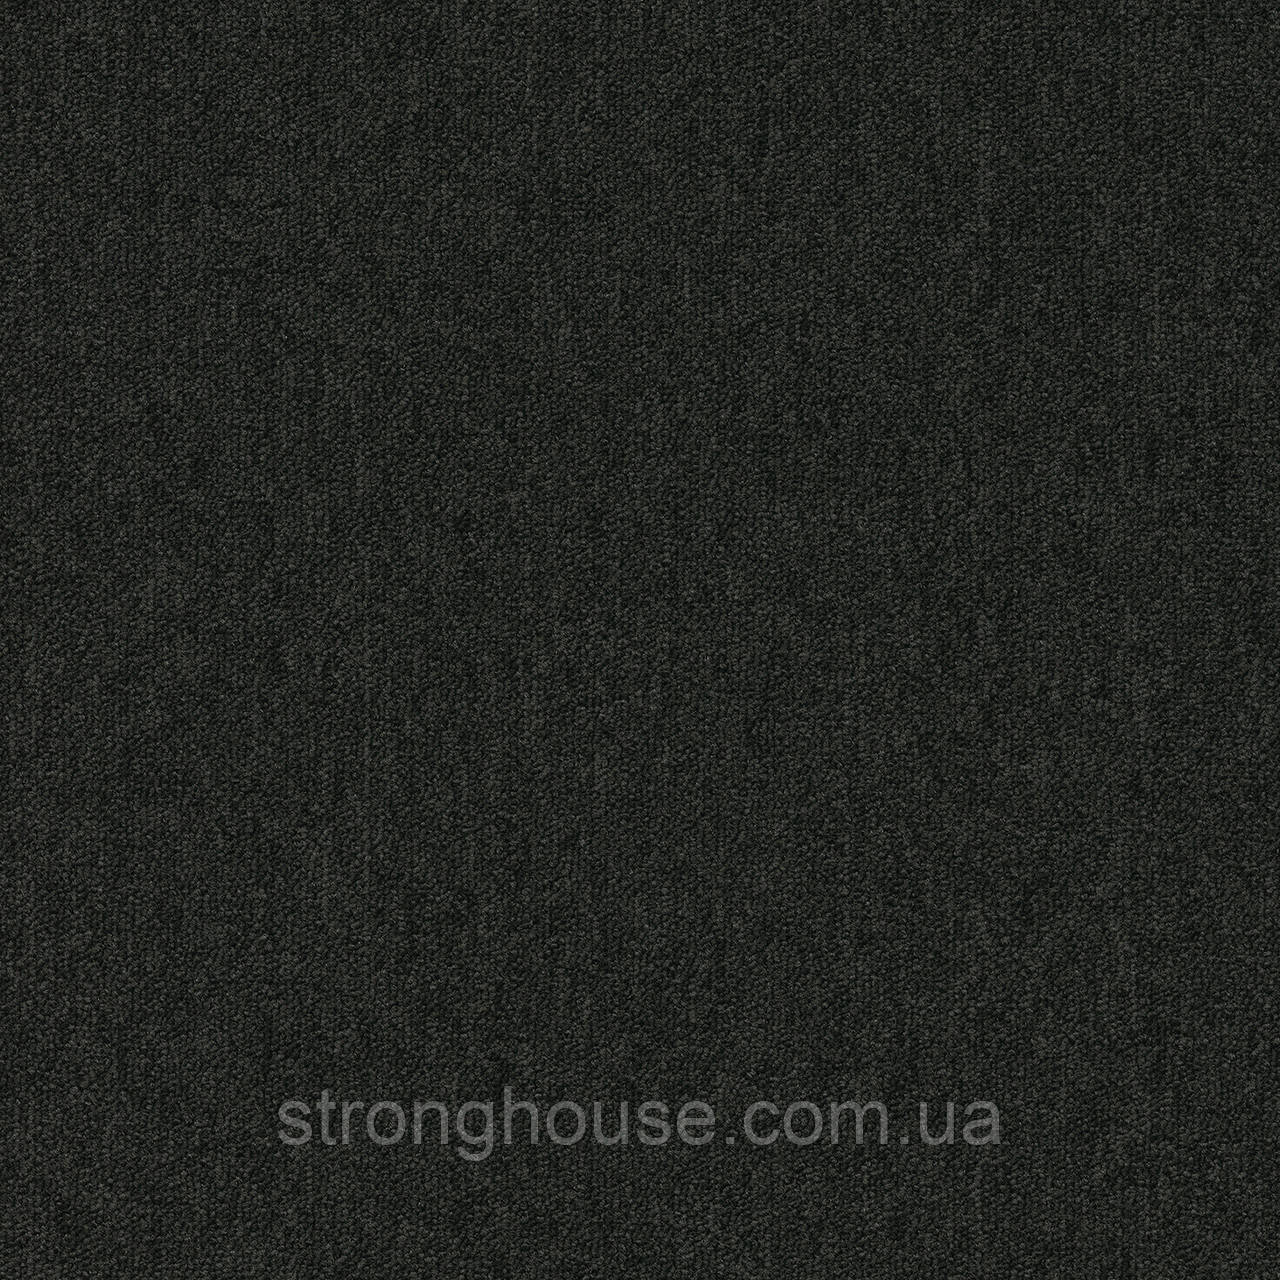 Domo Modulyss First 990 Ковровая плитка Фест 990